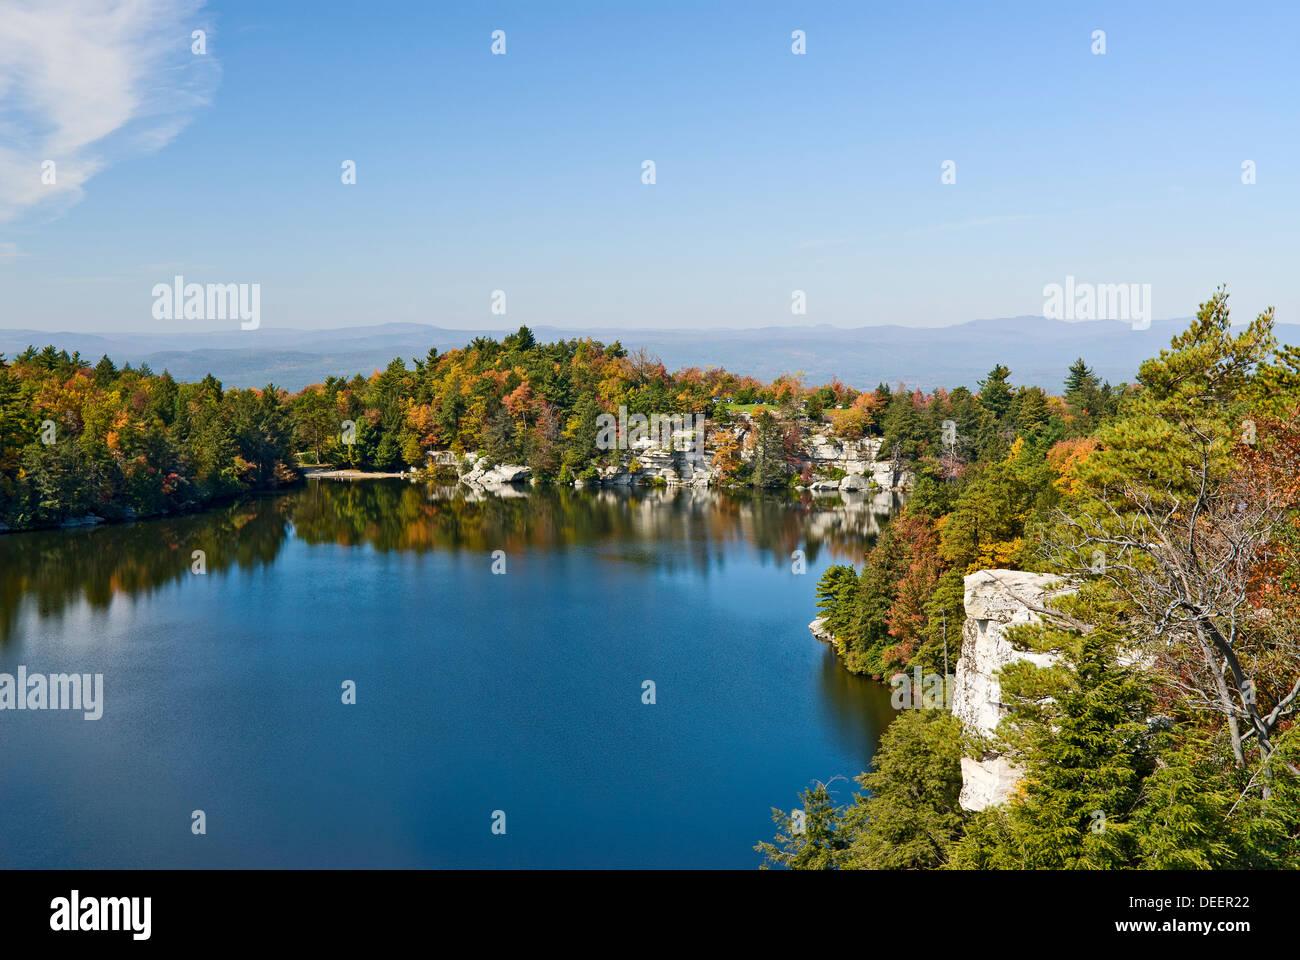 Herbstfarben am Lake Minnewaska am Minnewaska State Park Preserve, Ulster County, Bundesstaat New York. Stockbild